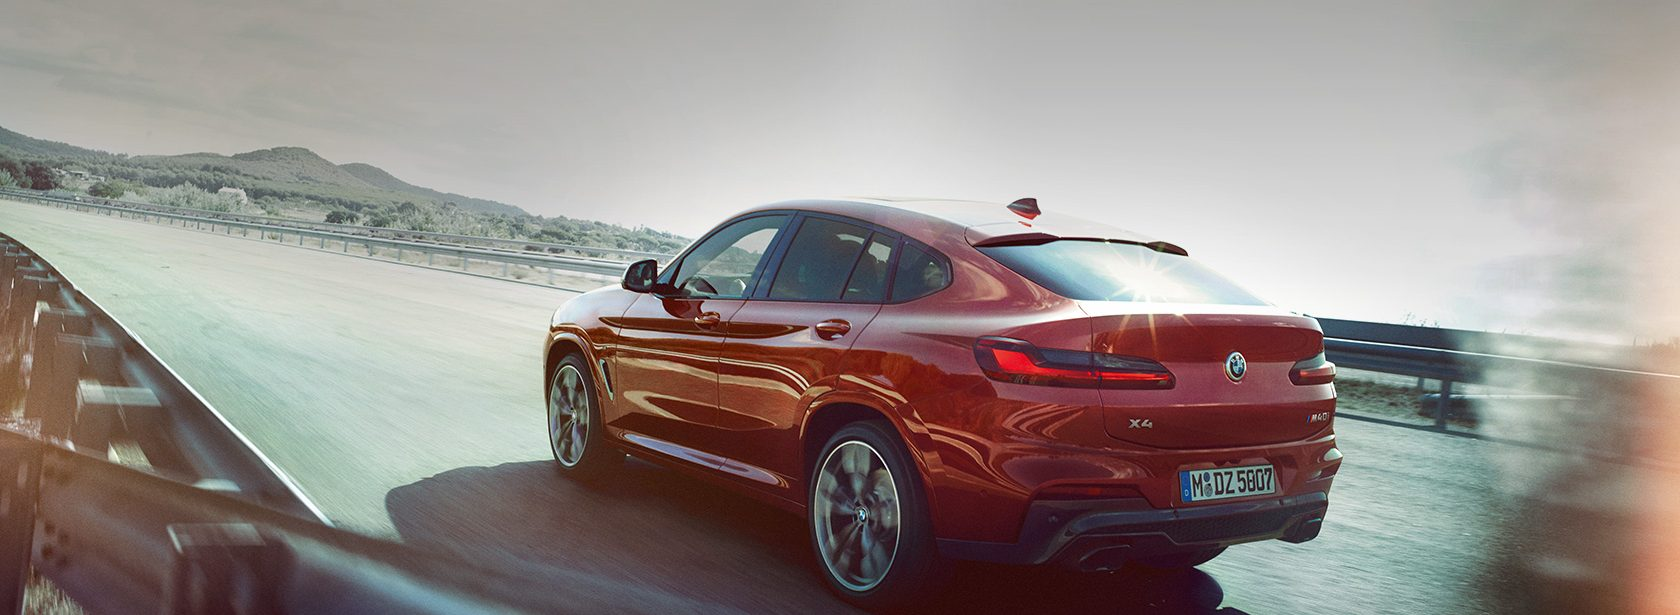 BMW X4 Heck